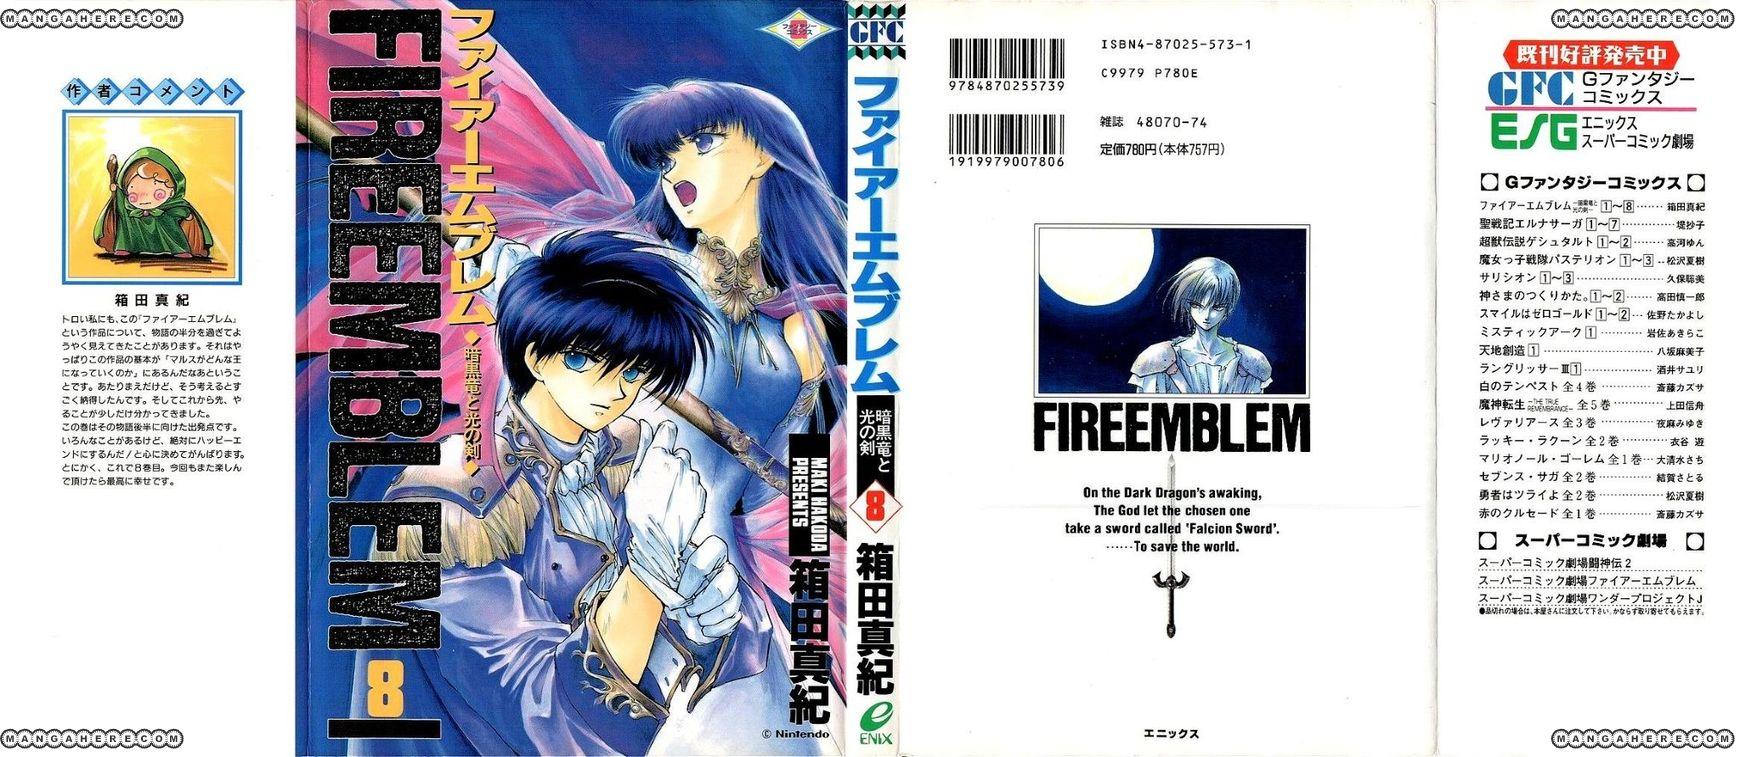 Fire Emblem: Ankokuryuu to Hikari no Ken 36 Page 1